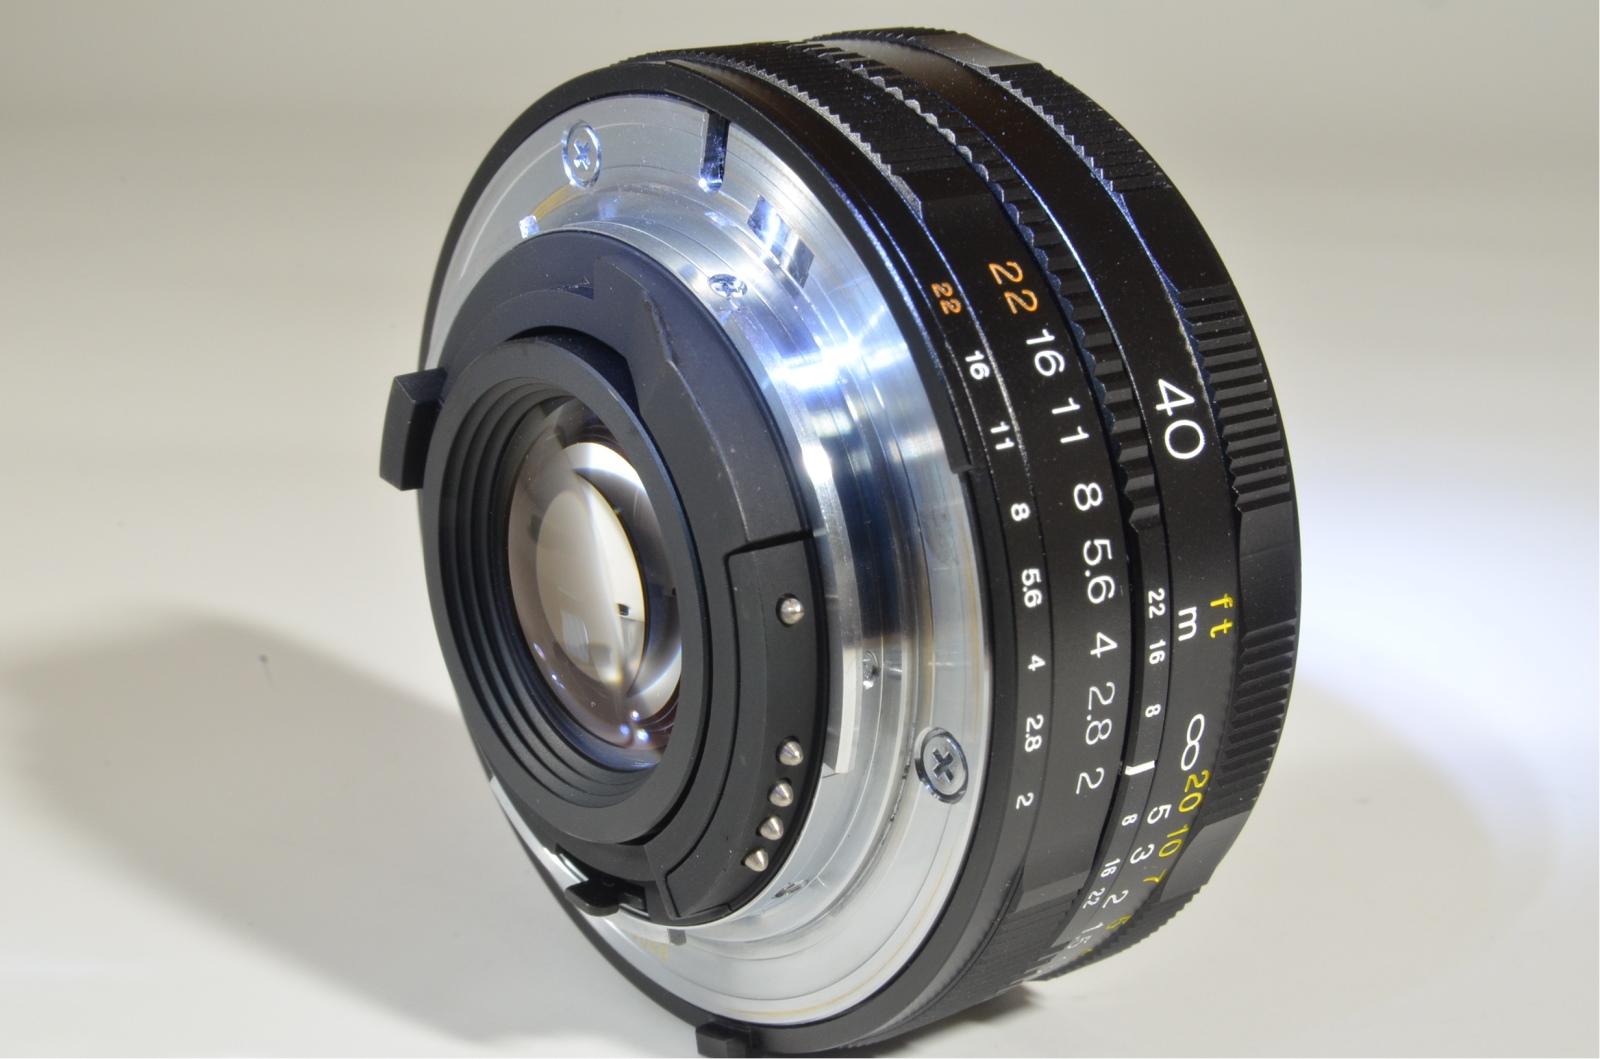 voigtlander ultron 40mm f/2 sl ii for nikon ai-s ais